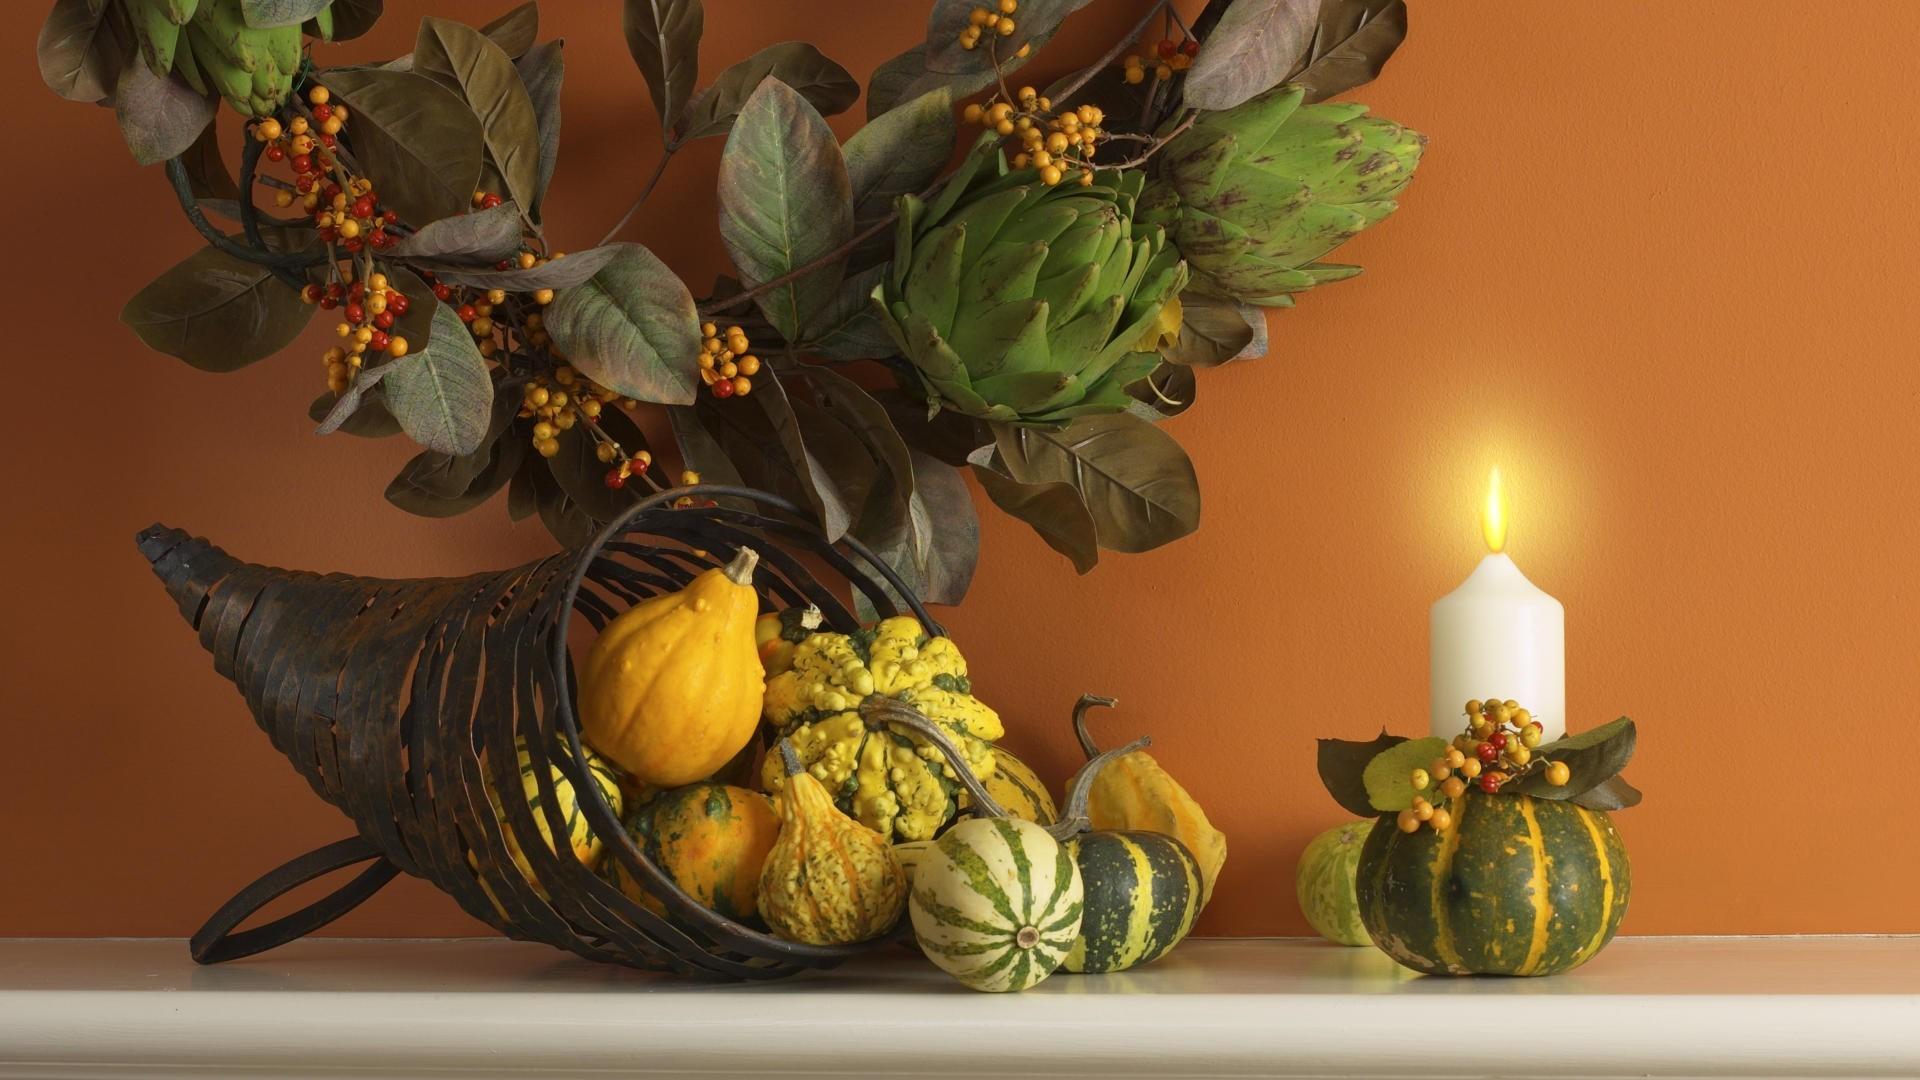 Thanksgiving Desktop Wallpapers - Thanksgiving Edible Cake Toppers - HD Wallpaper